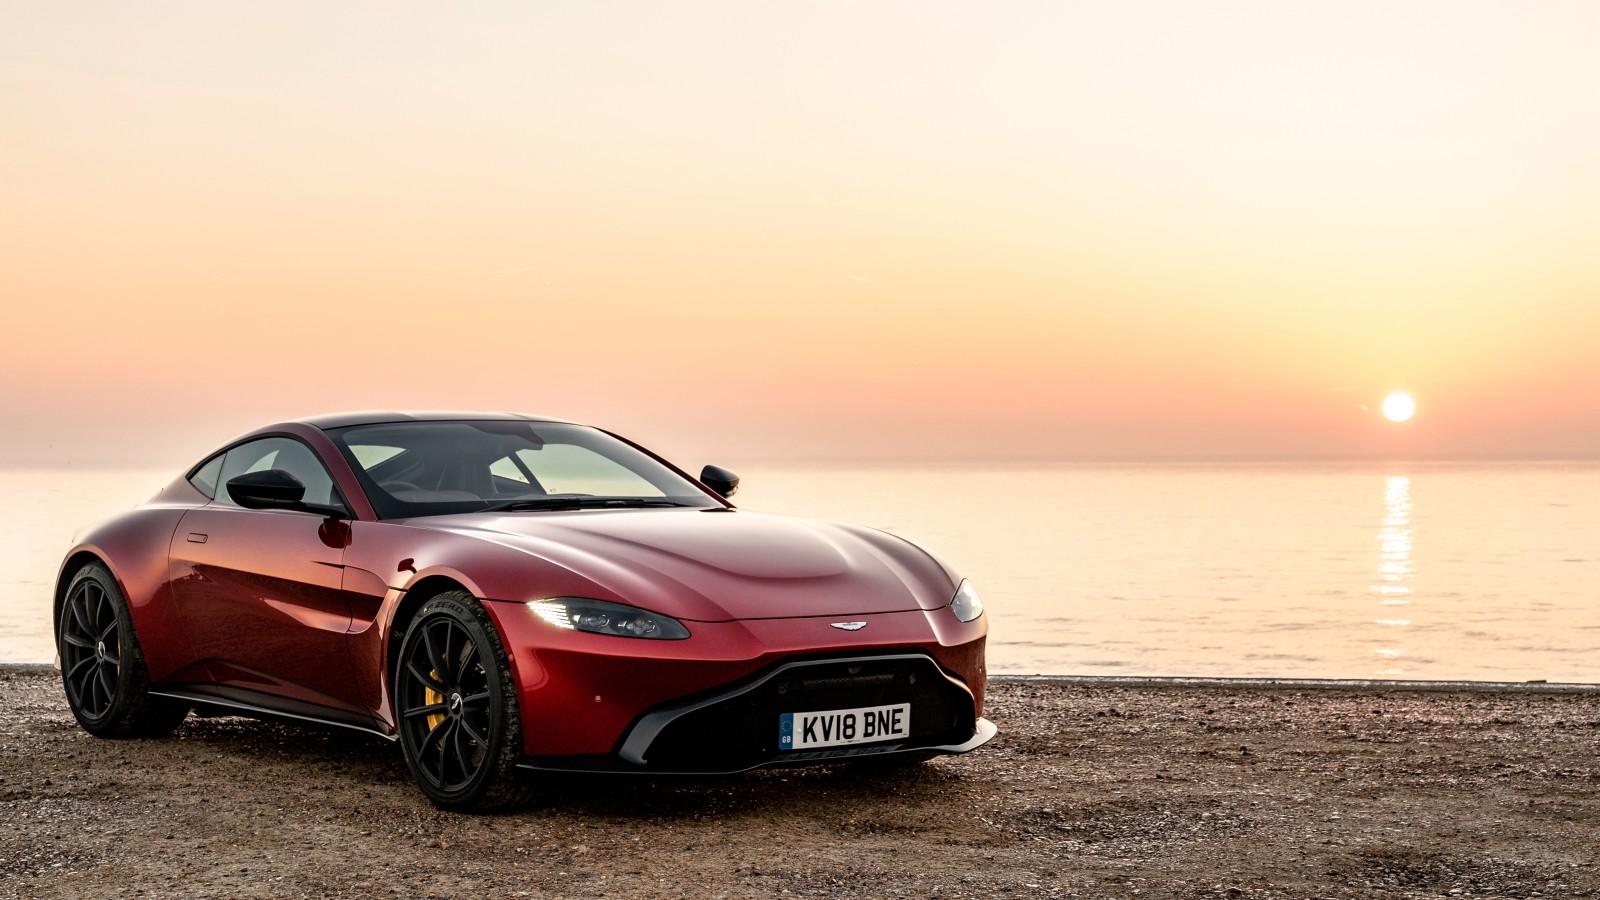 Aston Martin Vantage 2019 4K Wallpaper | HD Car Wallpapers | ID #11744